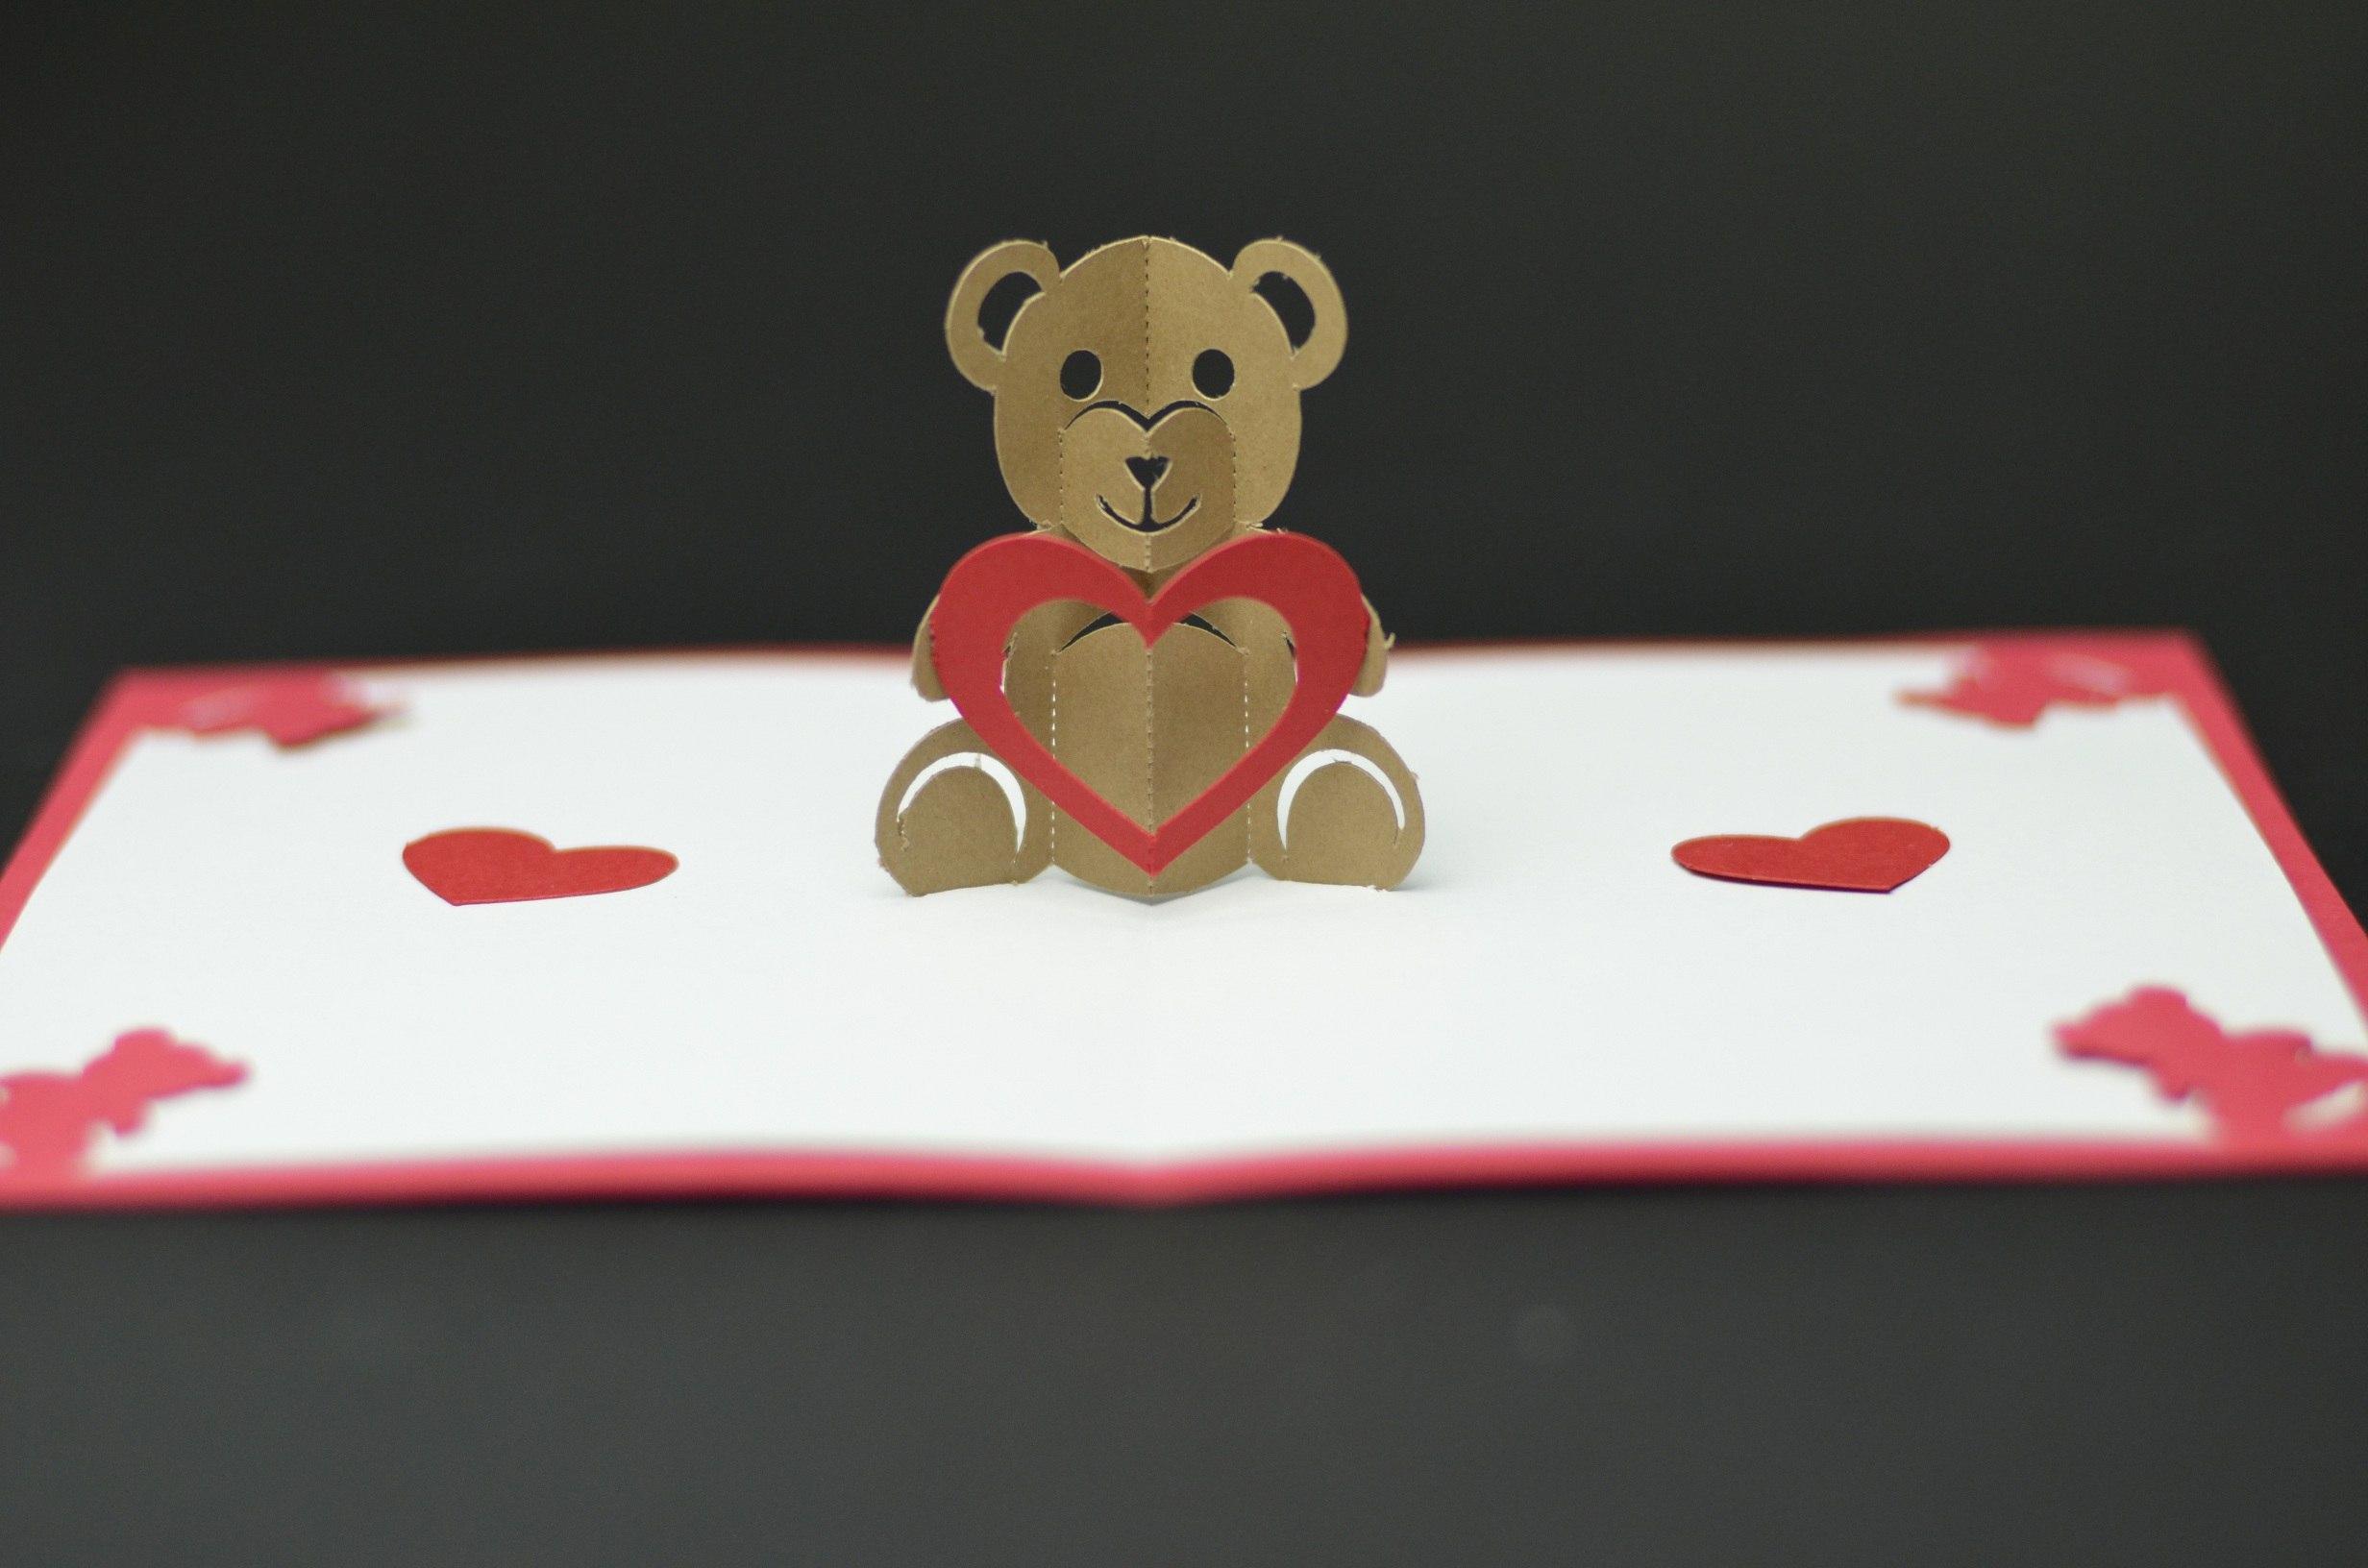 Teddy Bear Pop Up Card Template Pertaining To Diy Pop Up Cards Templates